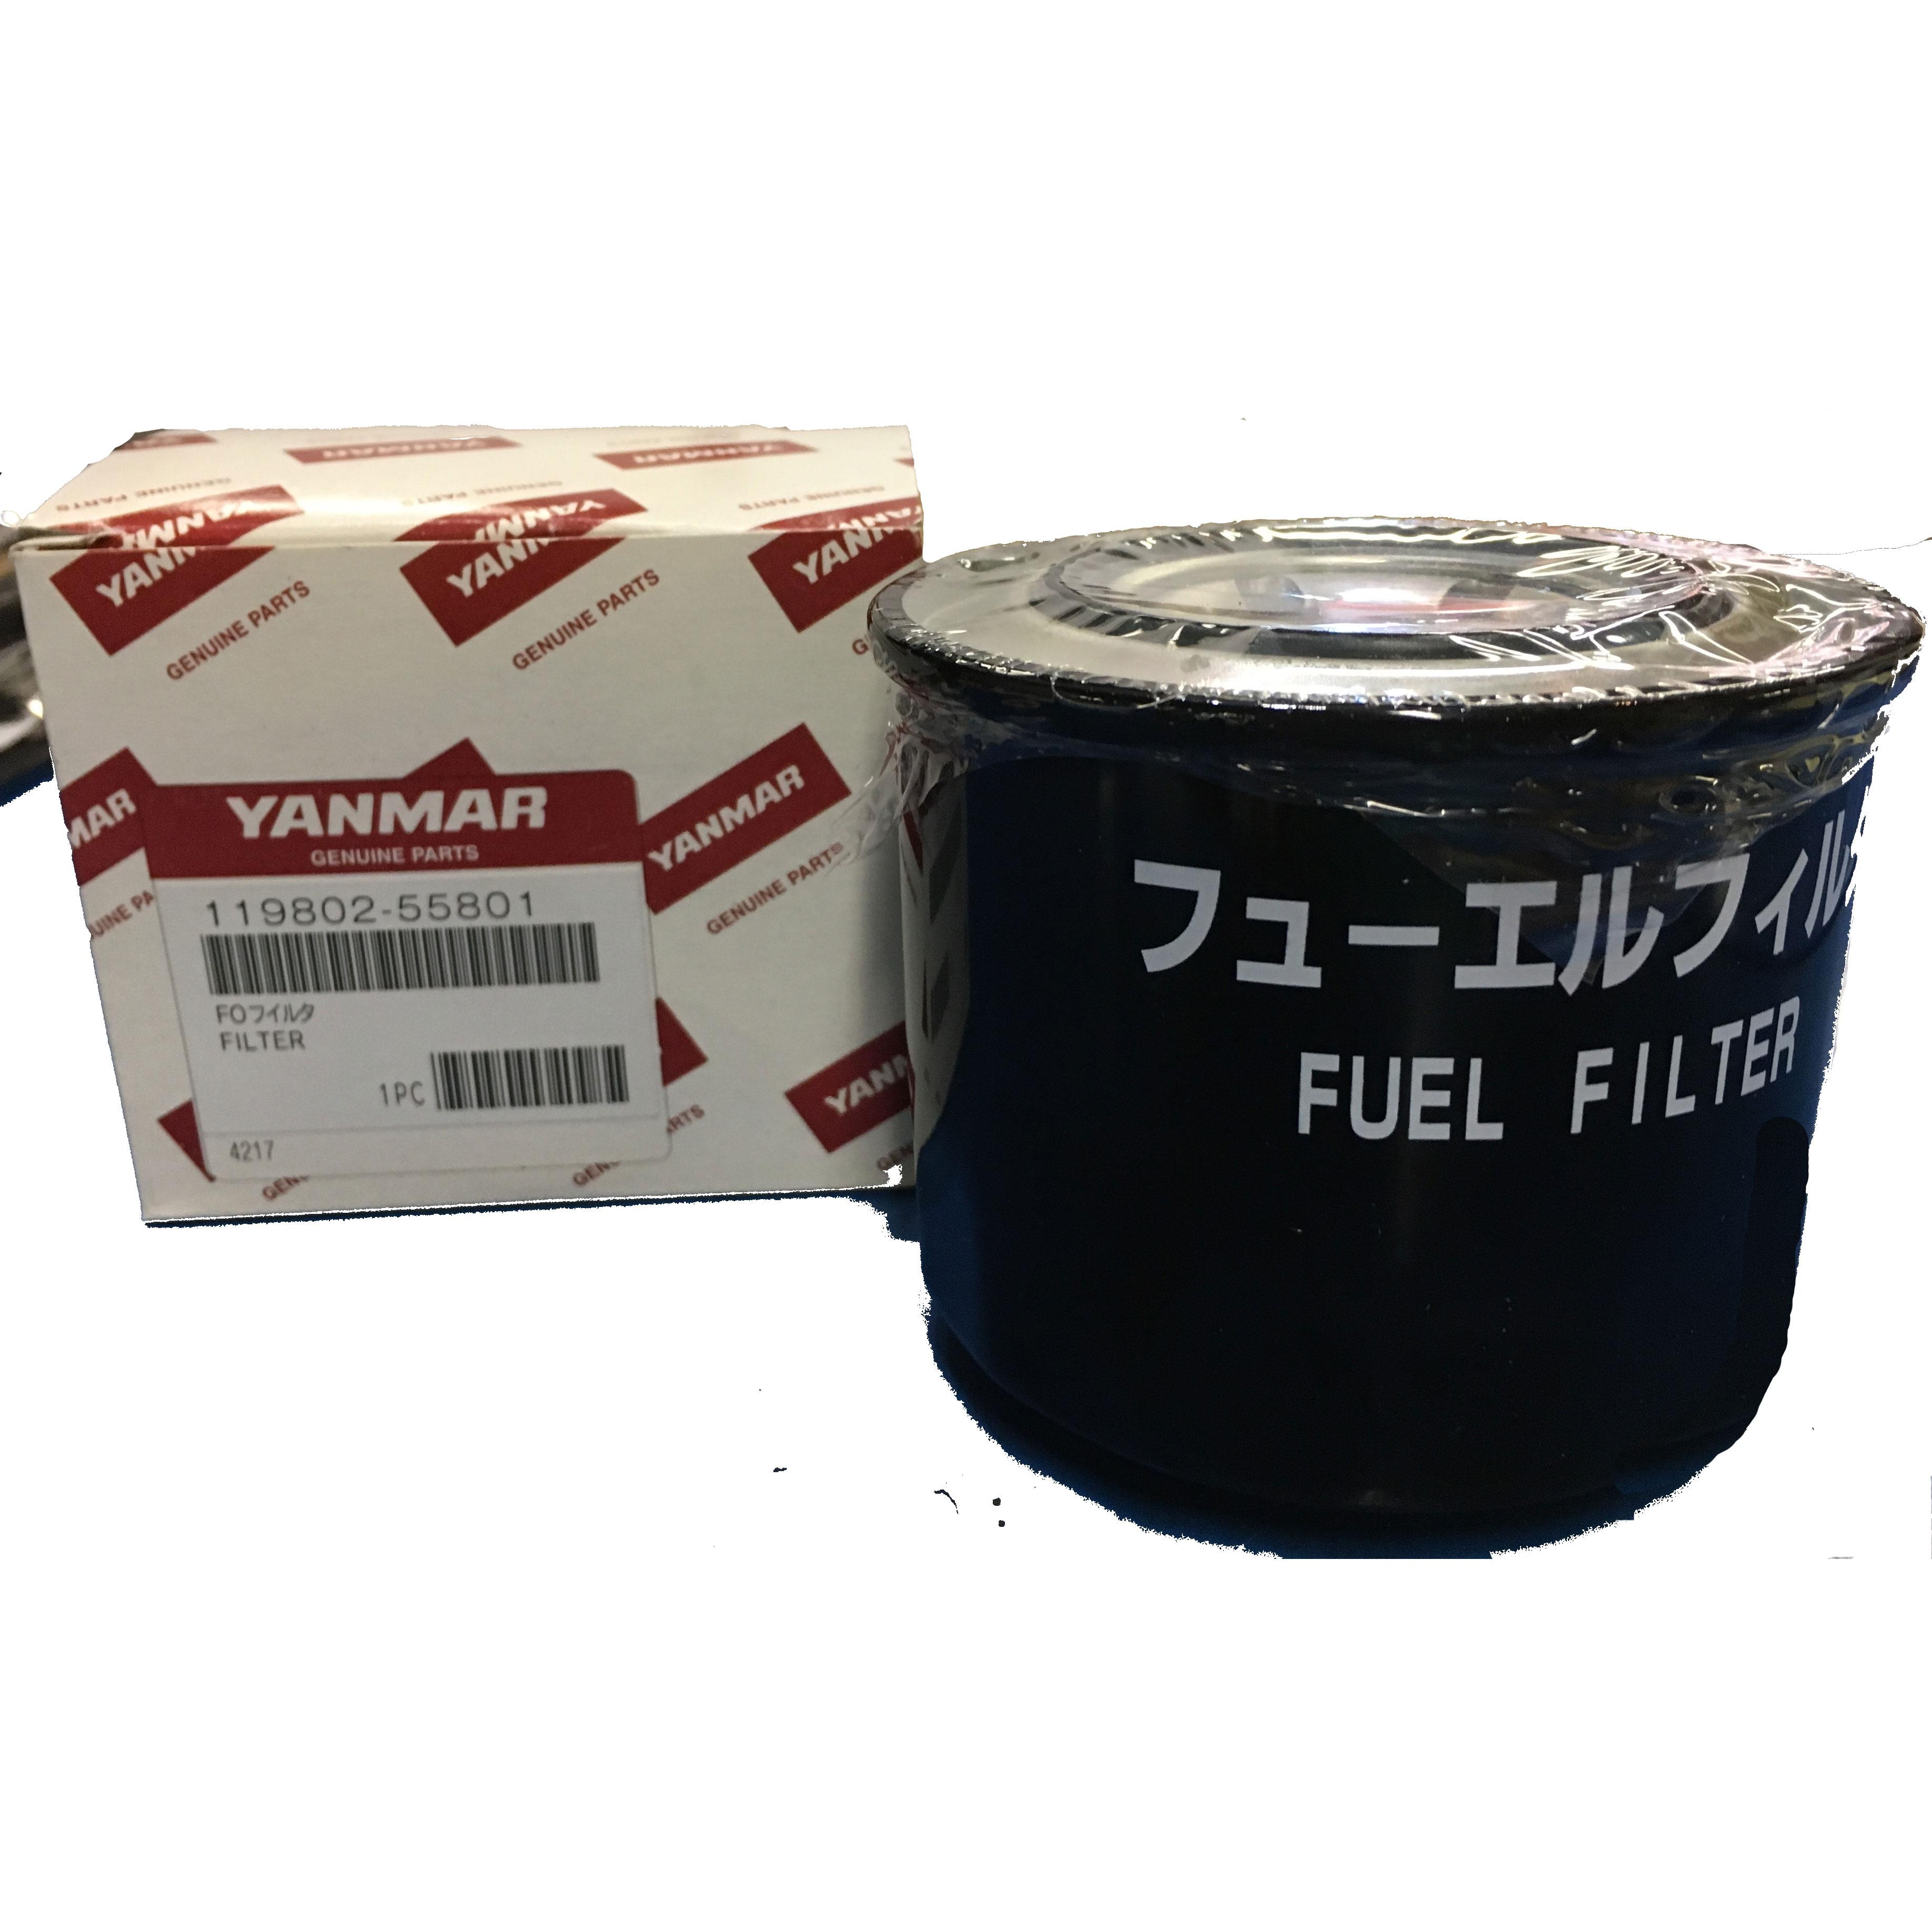 Kawasaki Fuel Filter Cross Reference